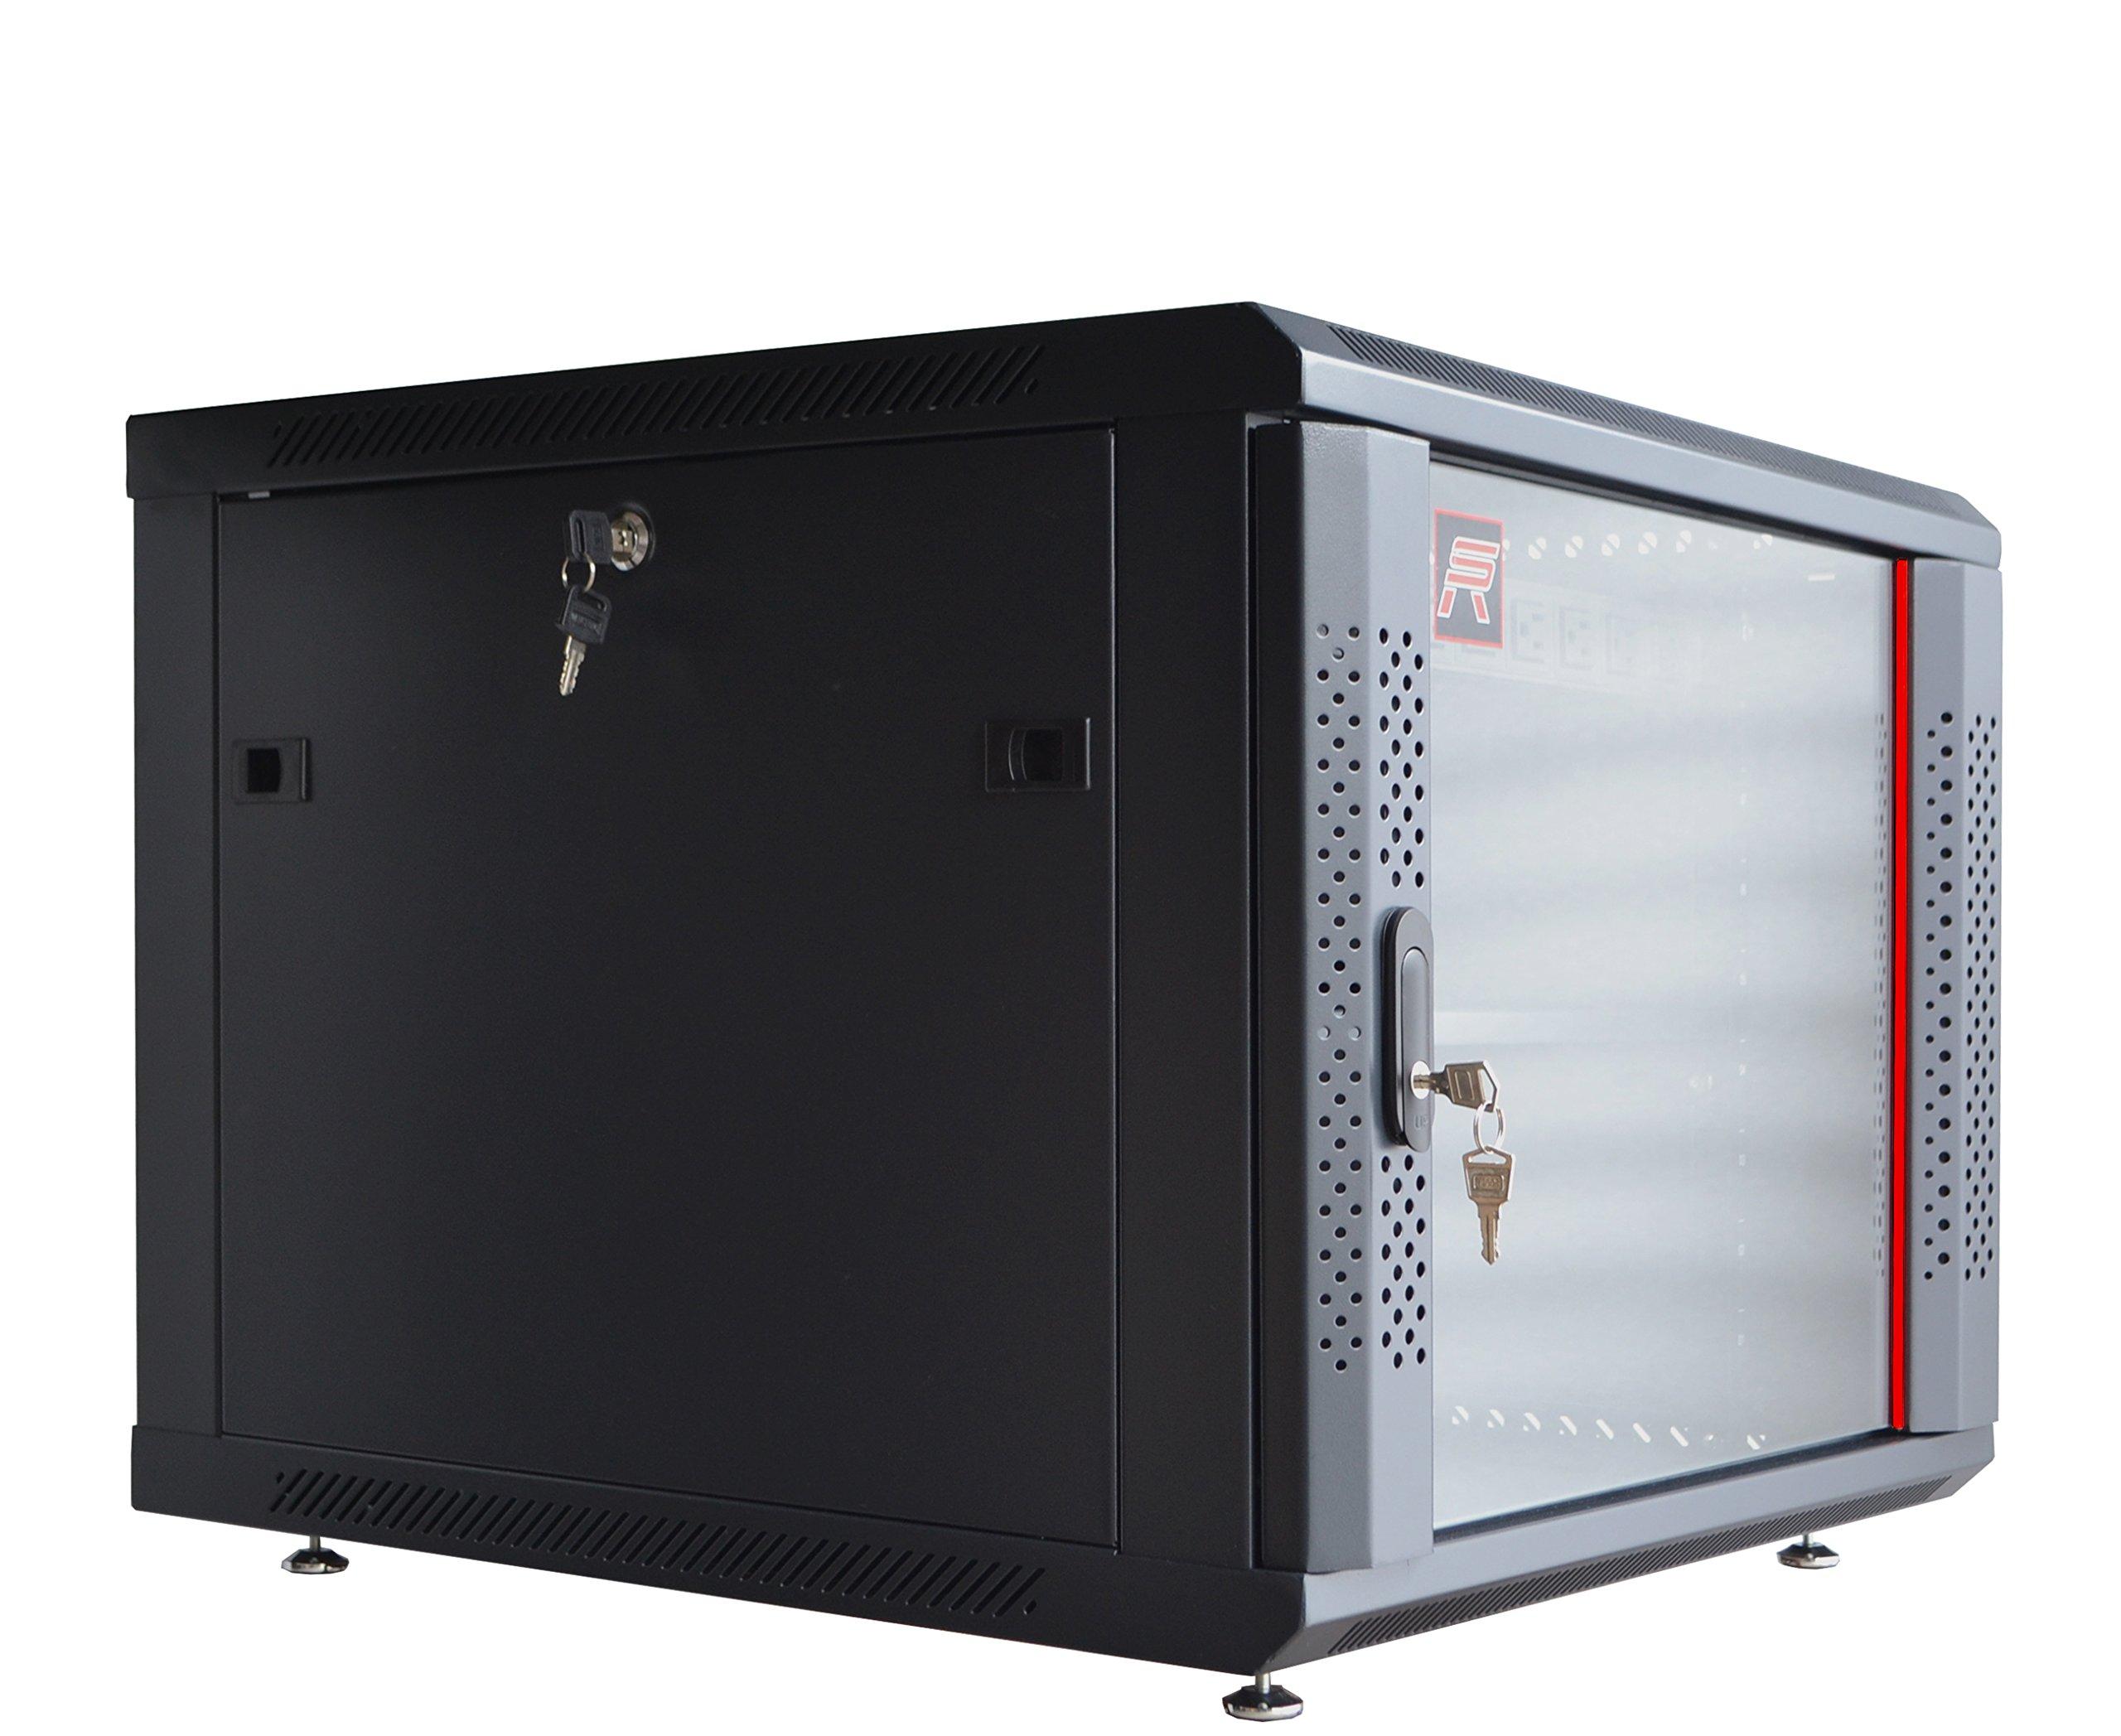 9U Server Rack Cabinet Enclosure. ACCESORIES FREE! Vented Shelf, Cooling Fan, Power Strip. Wall Mount 24'' Deep Fully Loaded Lockable Enclosure Box …